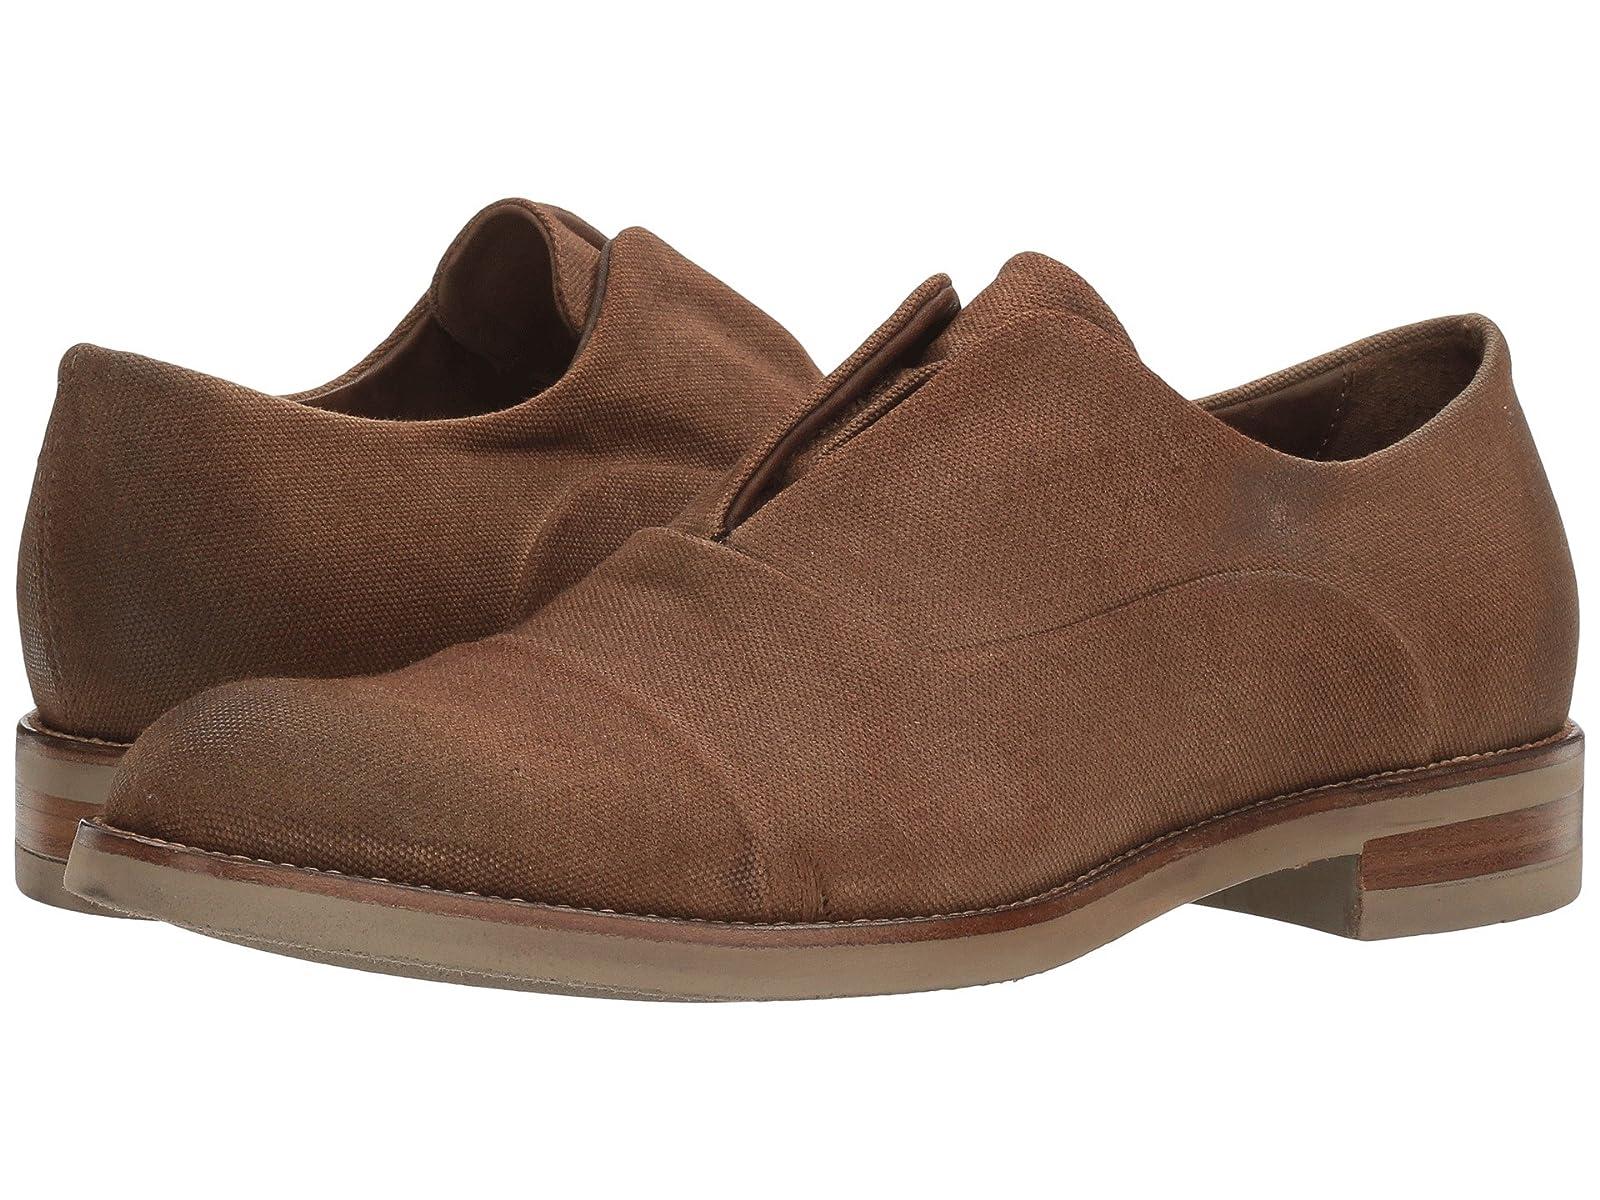 John Varvatos Jacob Blind DerbyCheap and distinctive eye-catching shoes